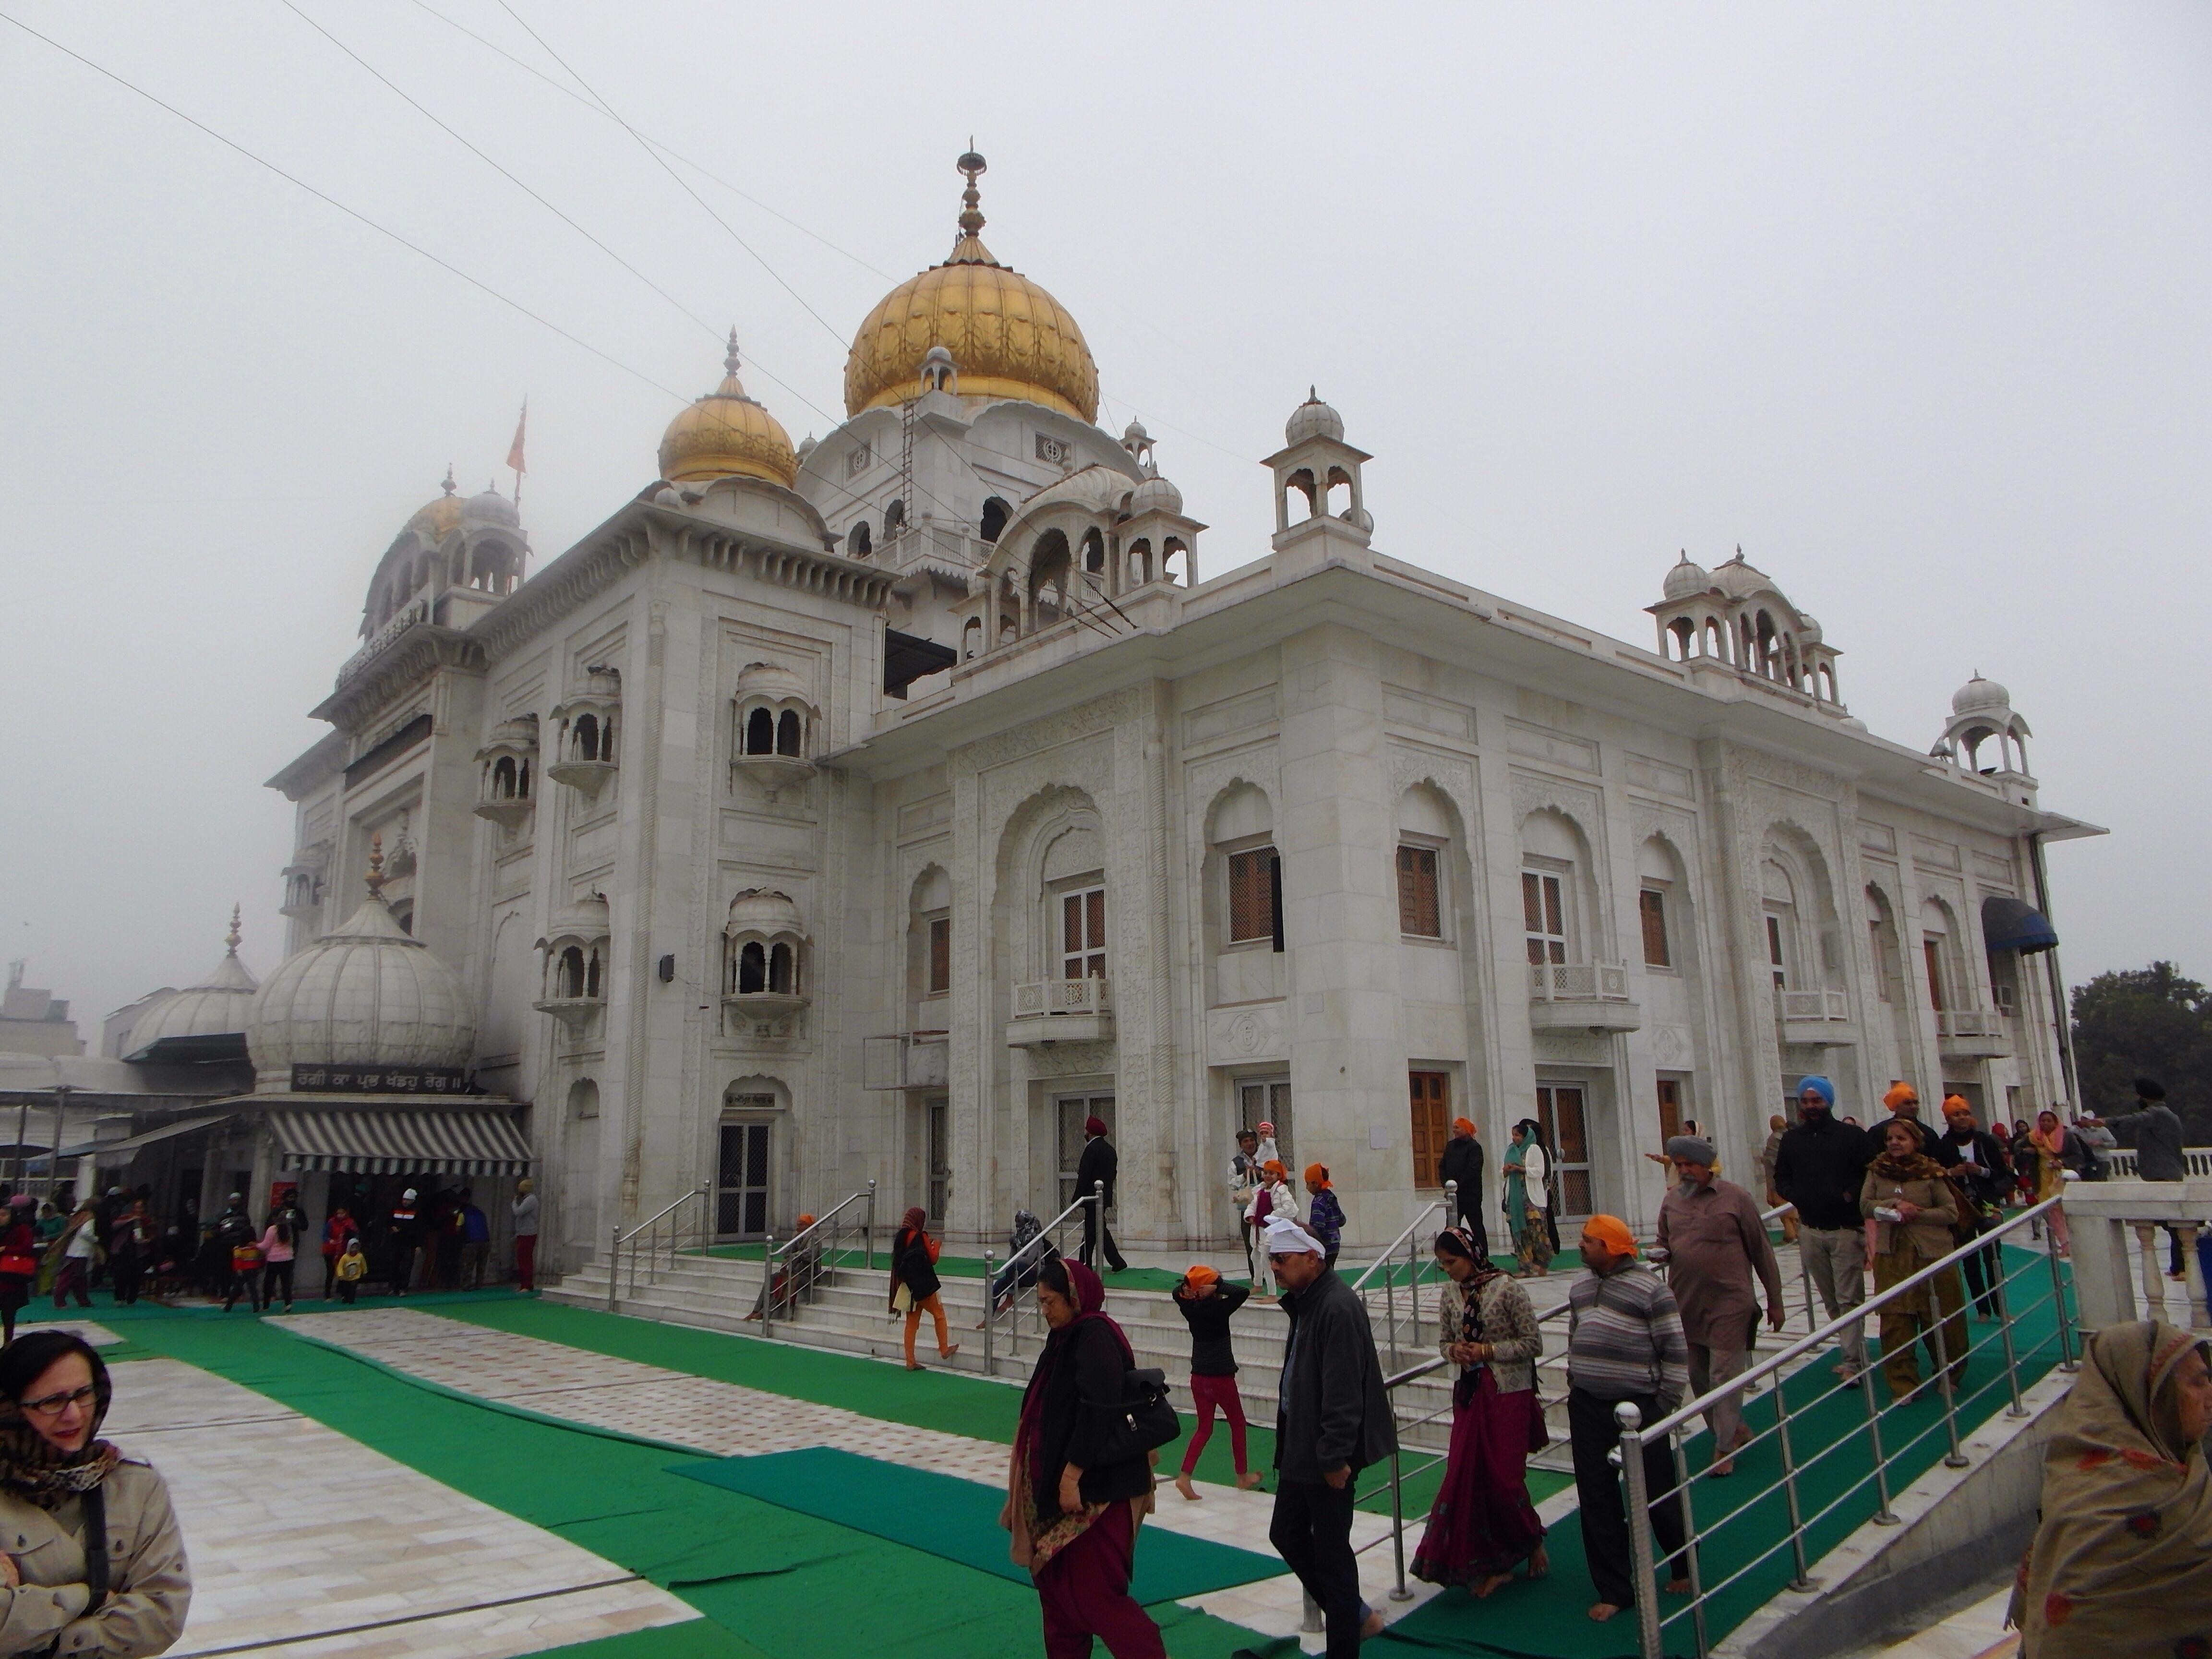 Sikhs : Gurdware Bangla Sahib in New Delhi, India